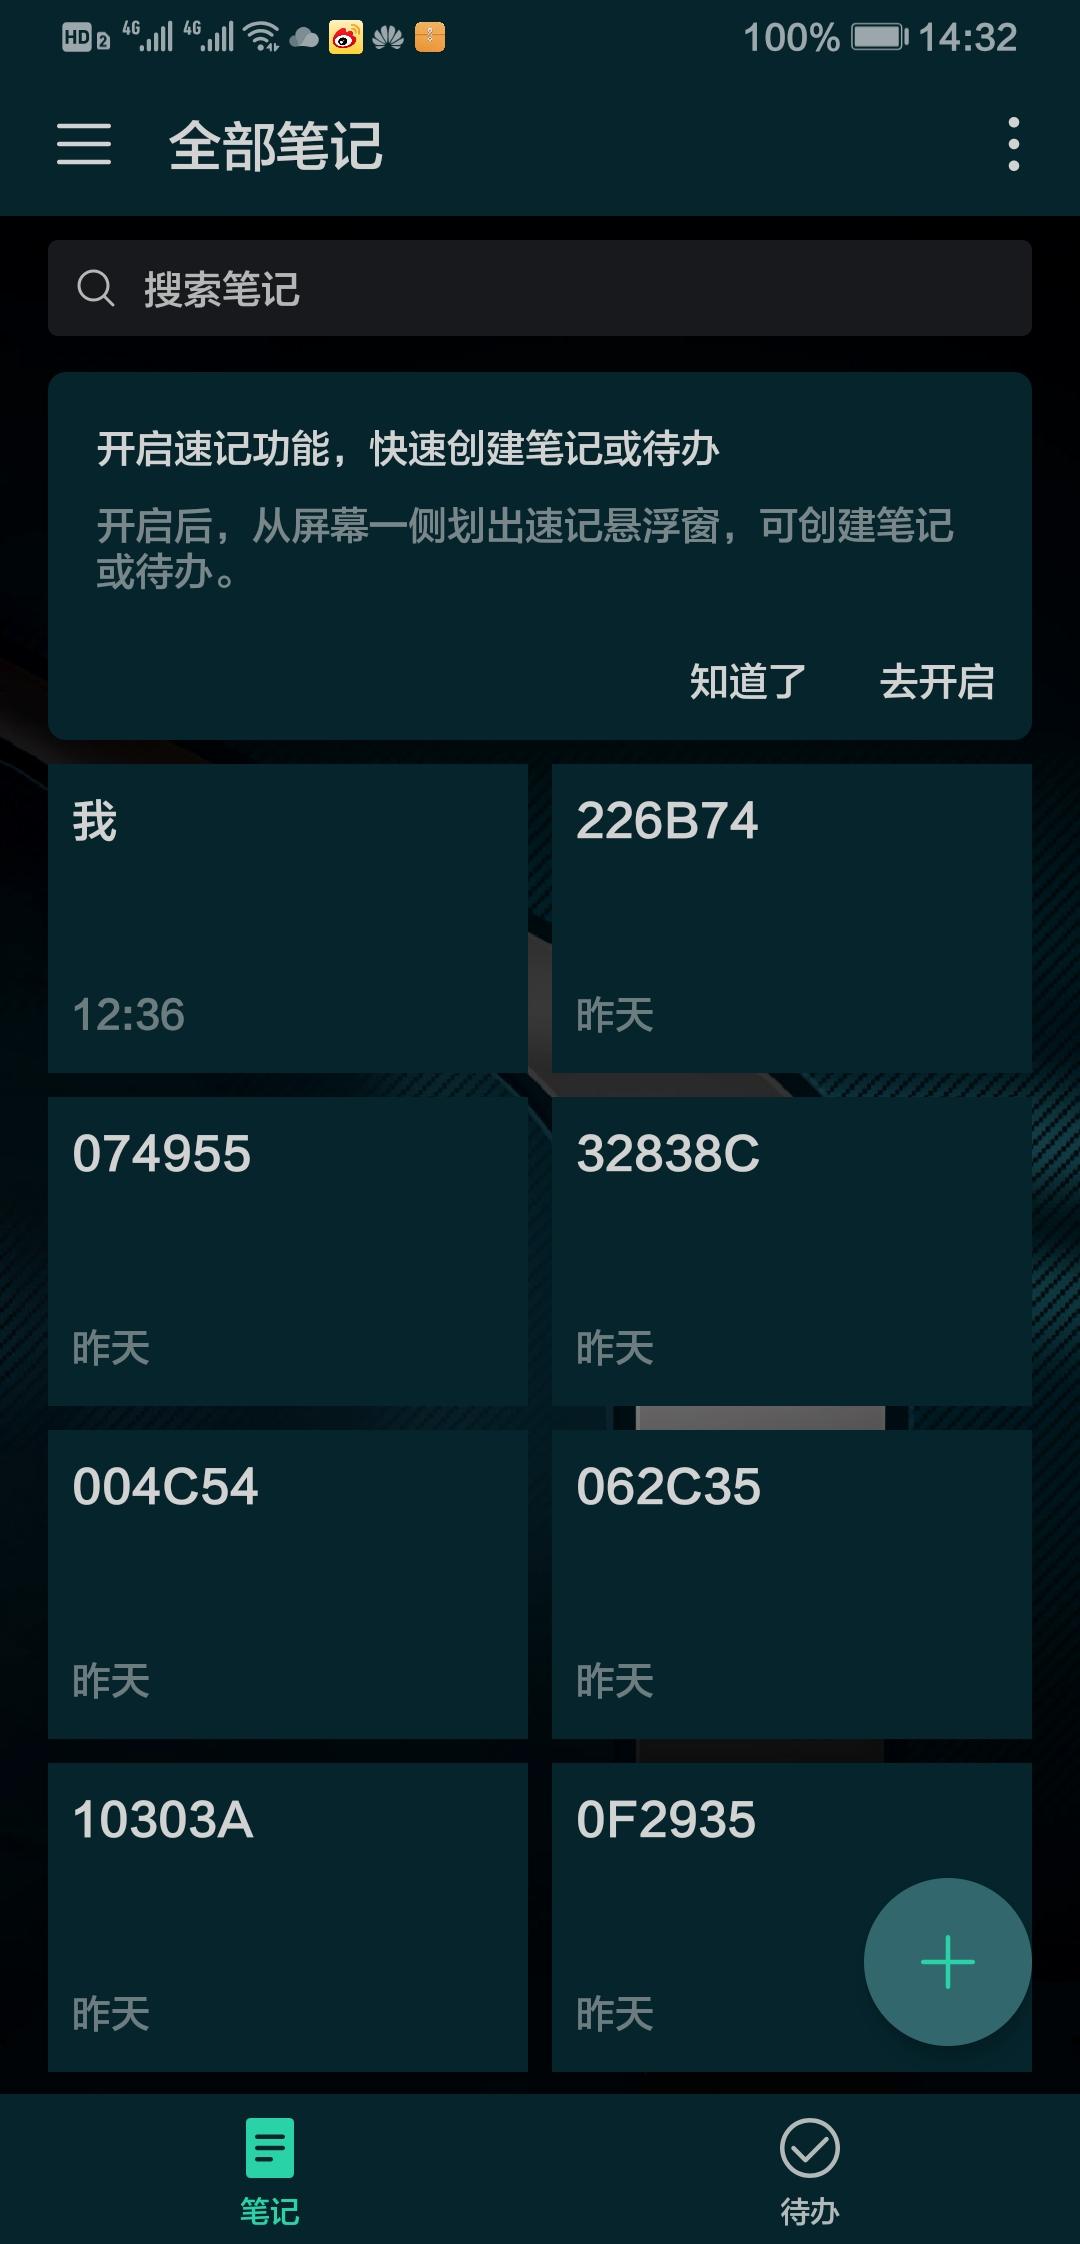 Screenshot_20190623_143233_com.example.android.notepad.jpg